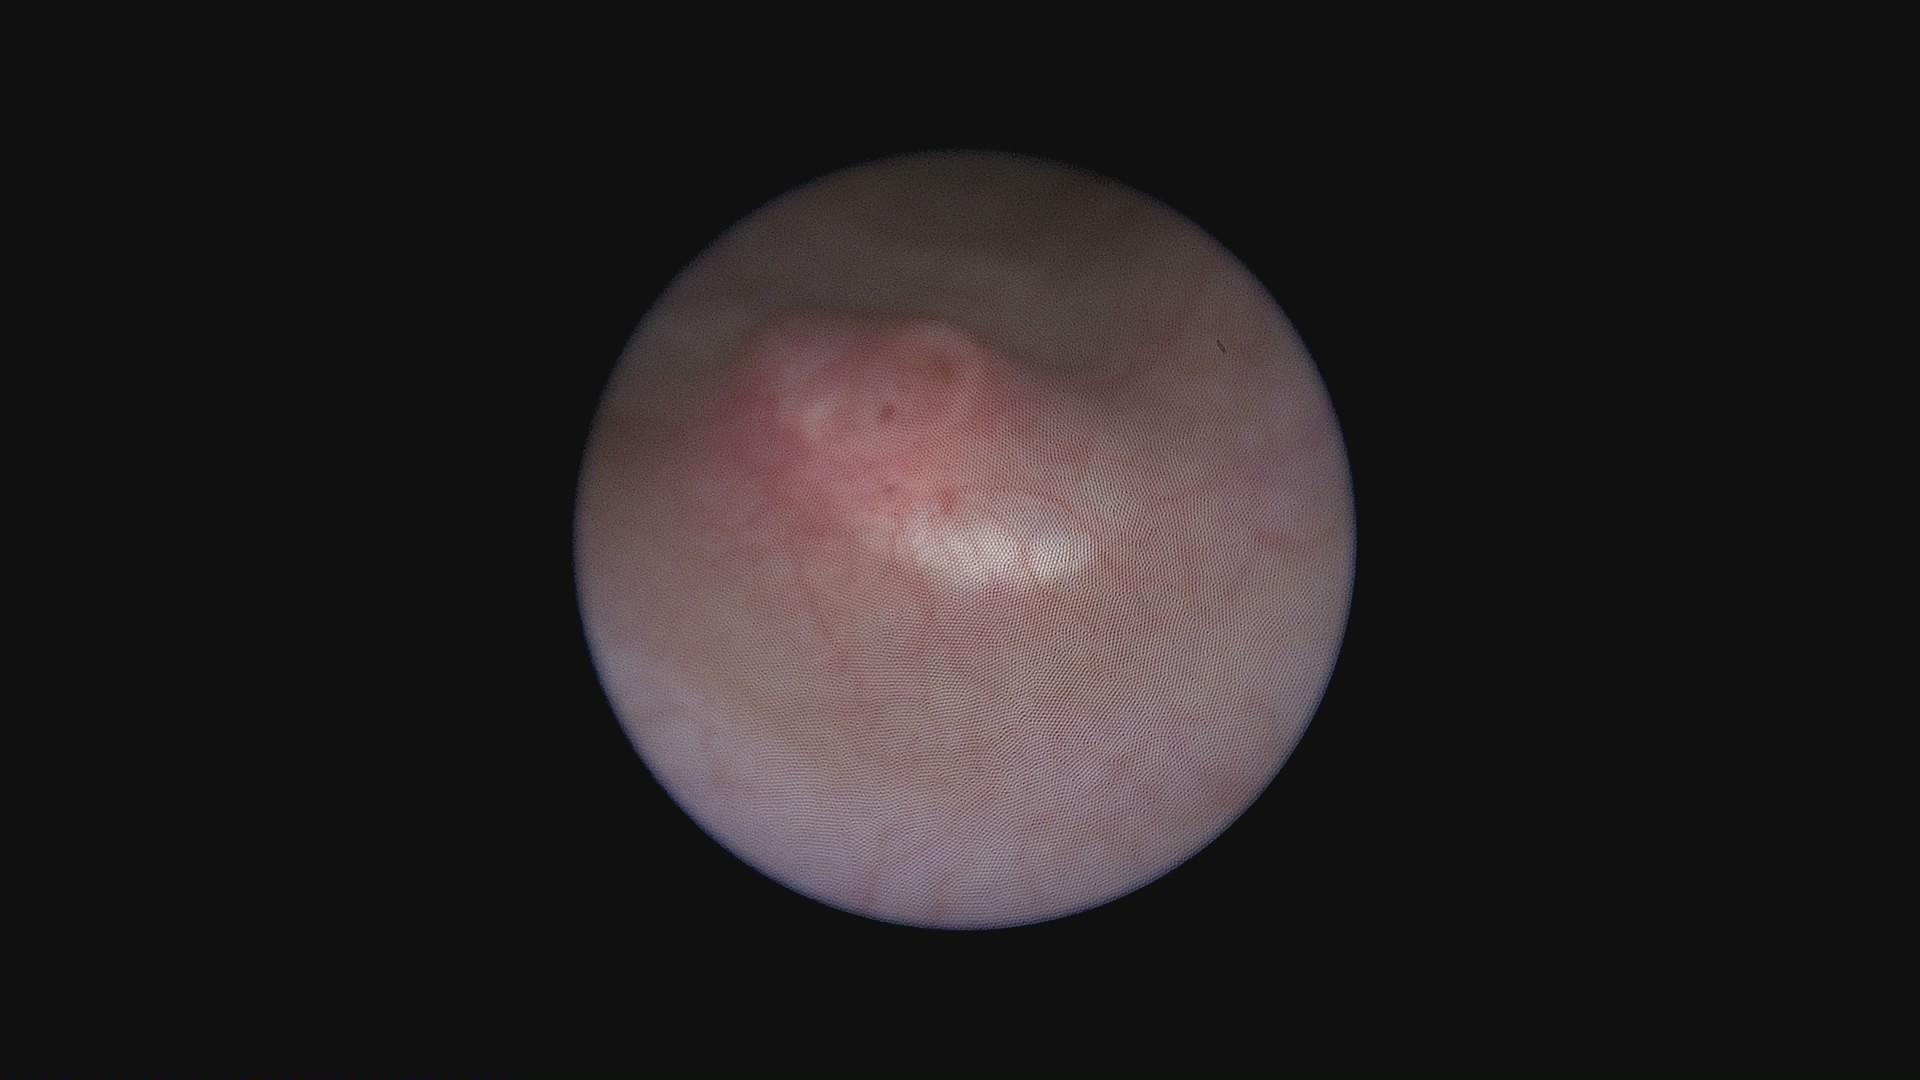 Vezikoureteralni refluks (VUR) kod dece - Nakon korekcije refluksa ubrizgavanjem endopaste